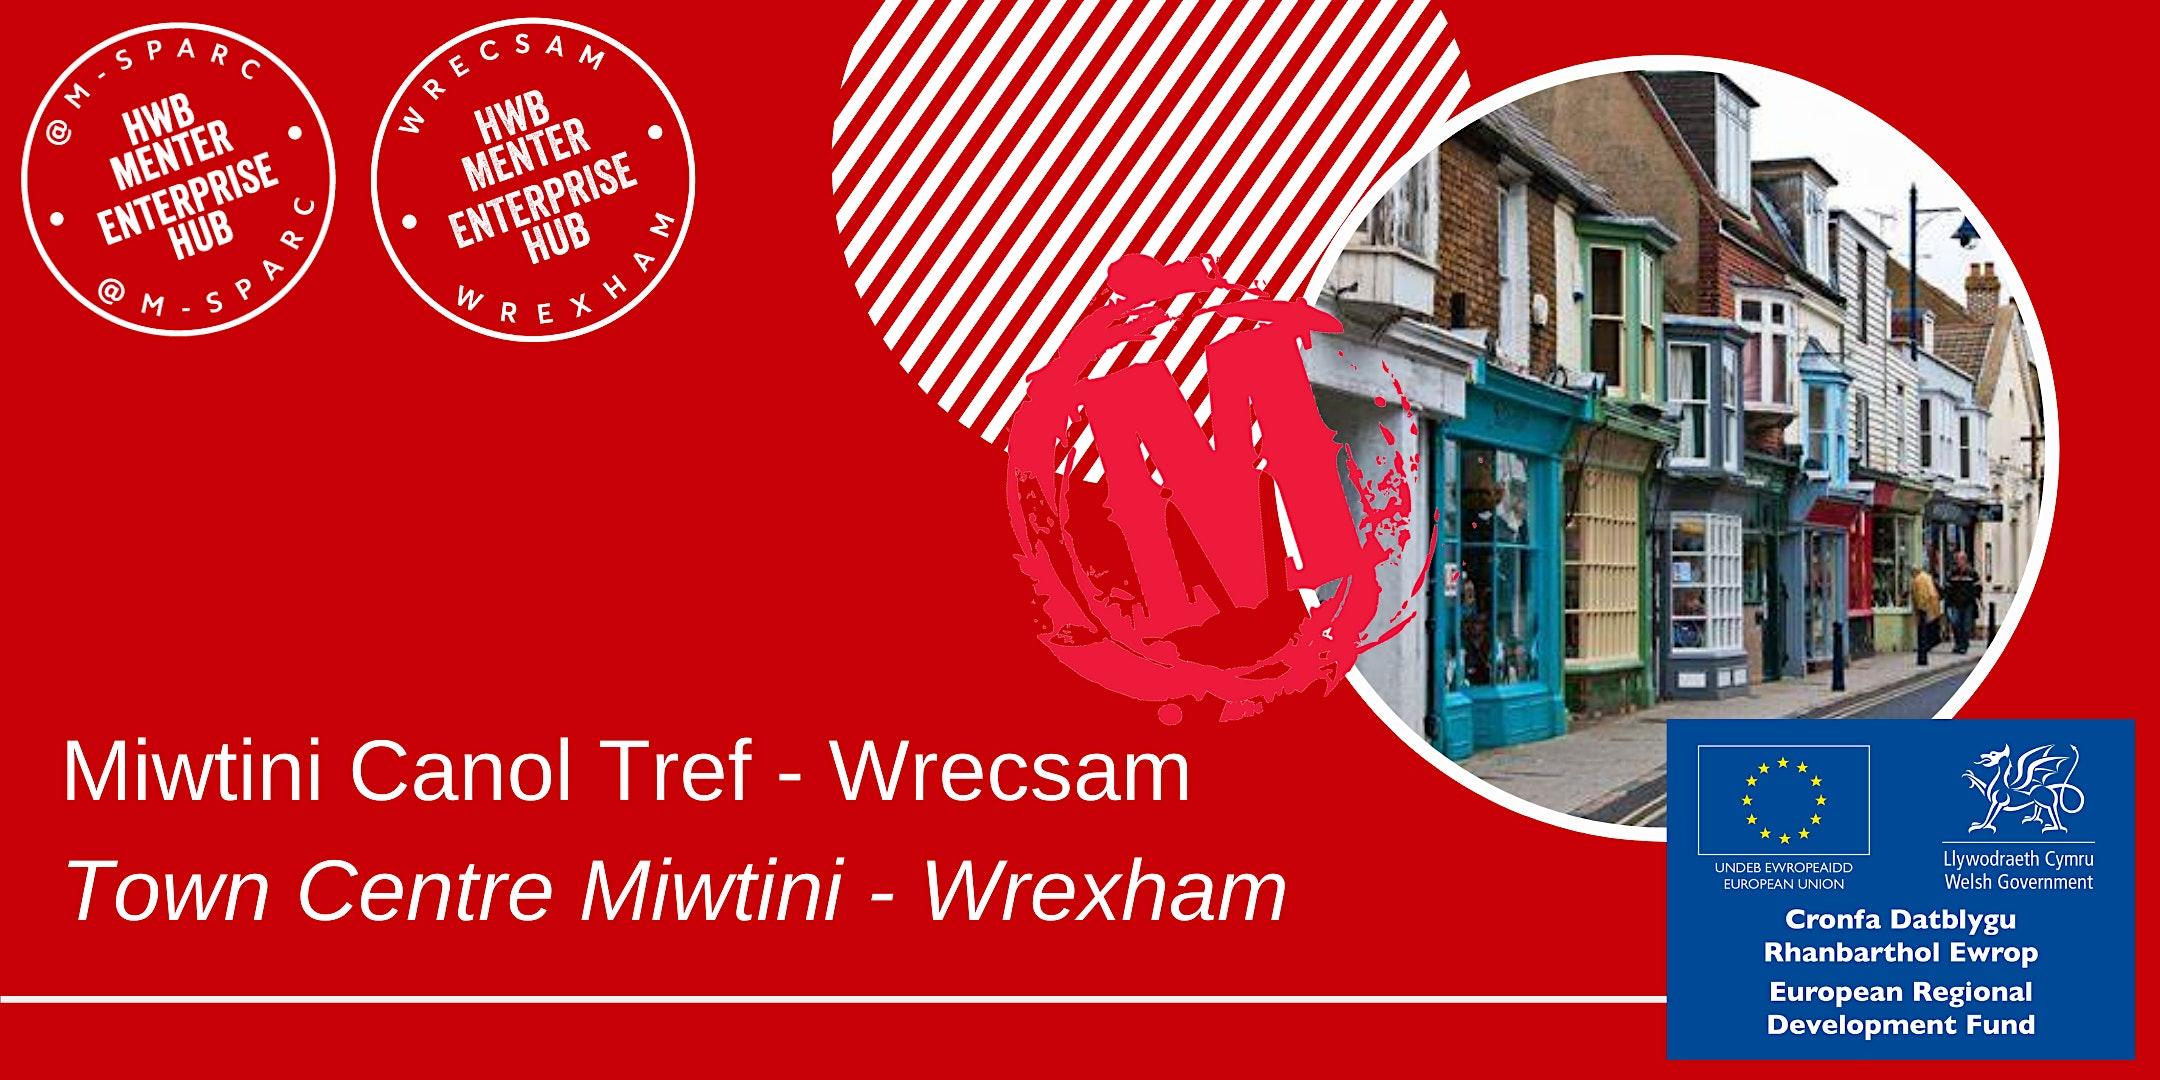 IN PERSON - Miwtini Canol Tref - Wrecsam / Town Centre Miwtini - Wrexham